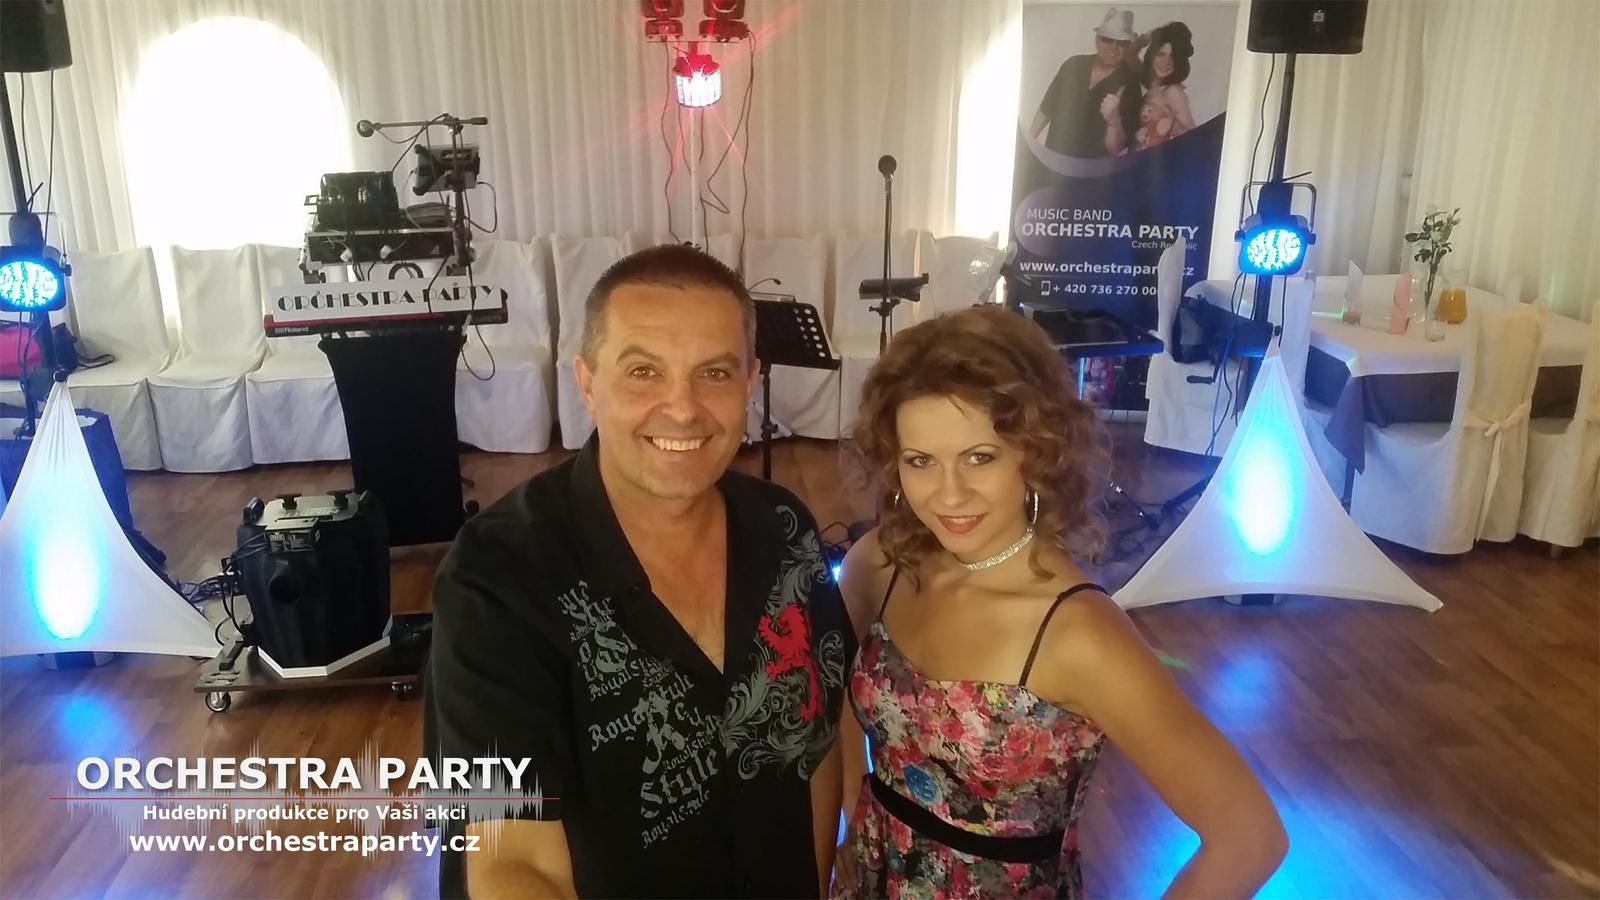 orchestraparty - Svatba 2020